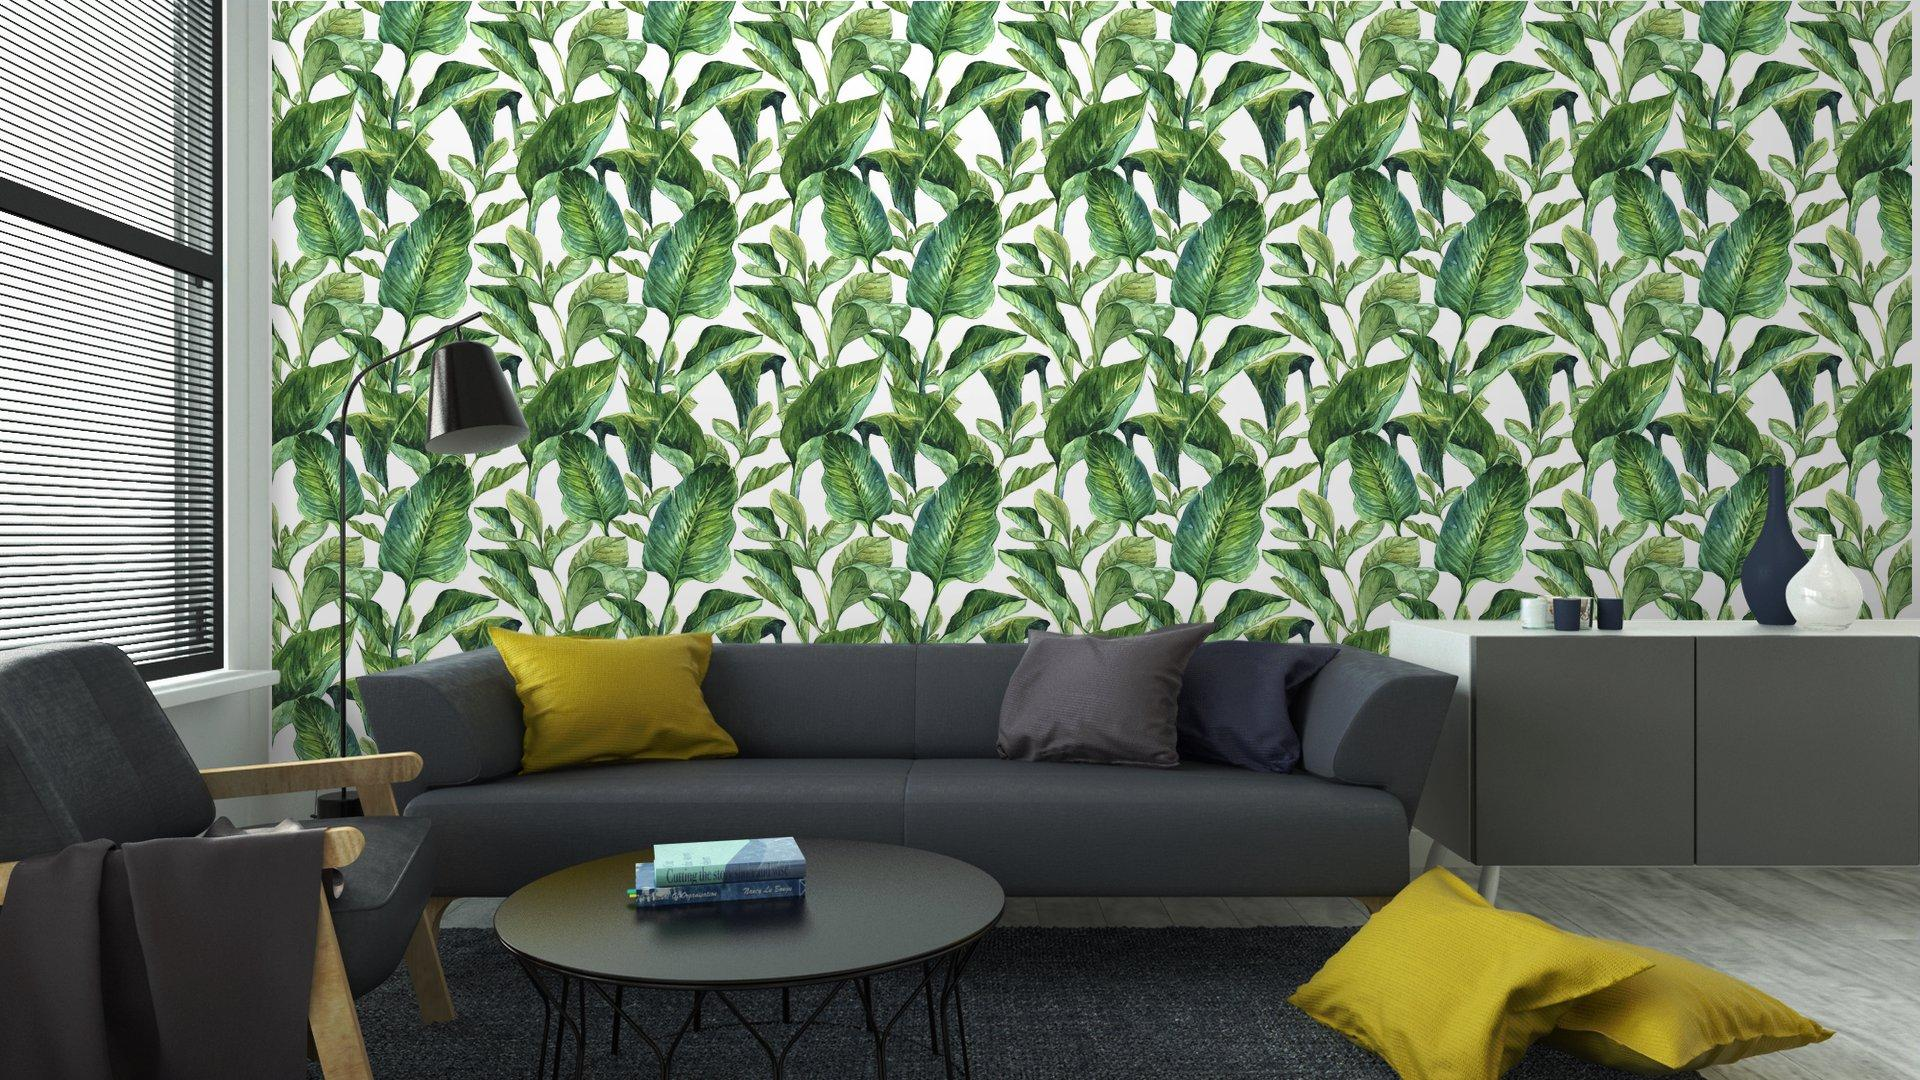 Fotomurales mexico papeles pintados fondo inconsutil de la acuarela con hojas tropicales 5 - Papel Tapiz Hojas Tropicales Tipo Acuarela en Fondo Blanco 06